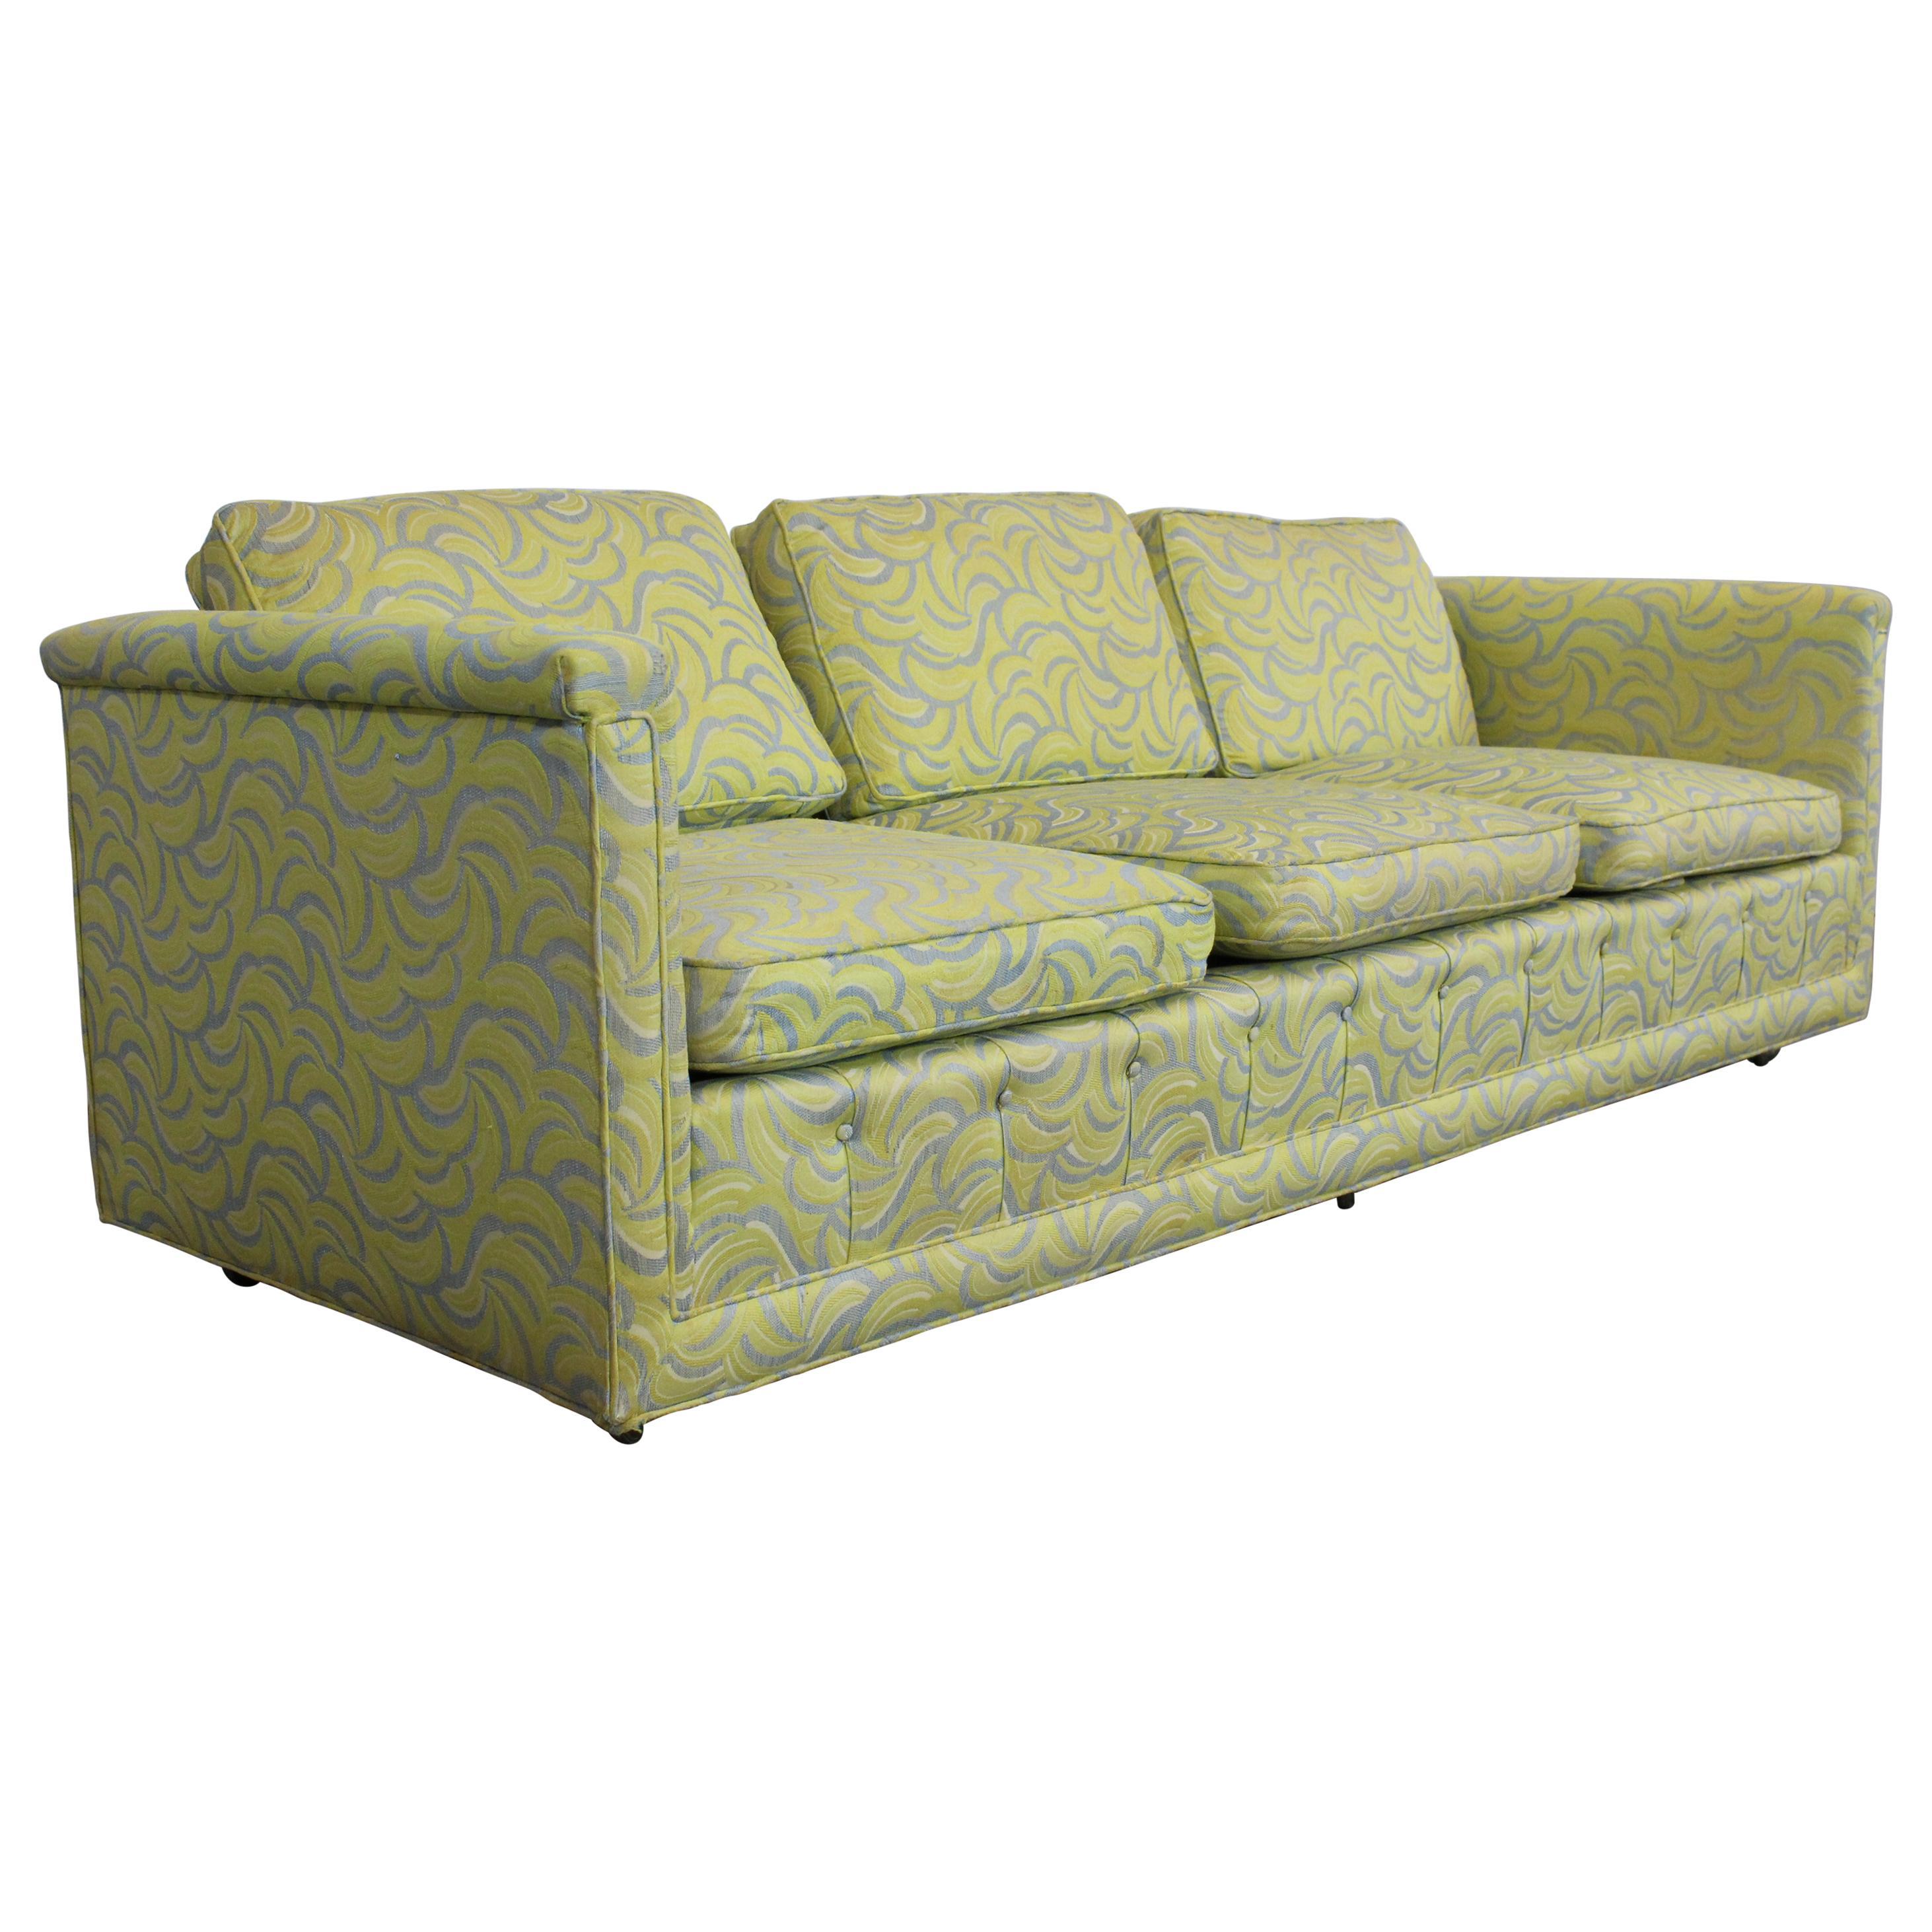 Mid-Century Modern Milo Baughman Style Low Sofa